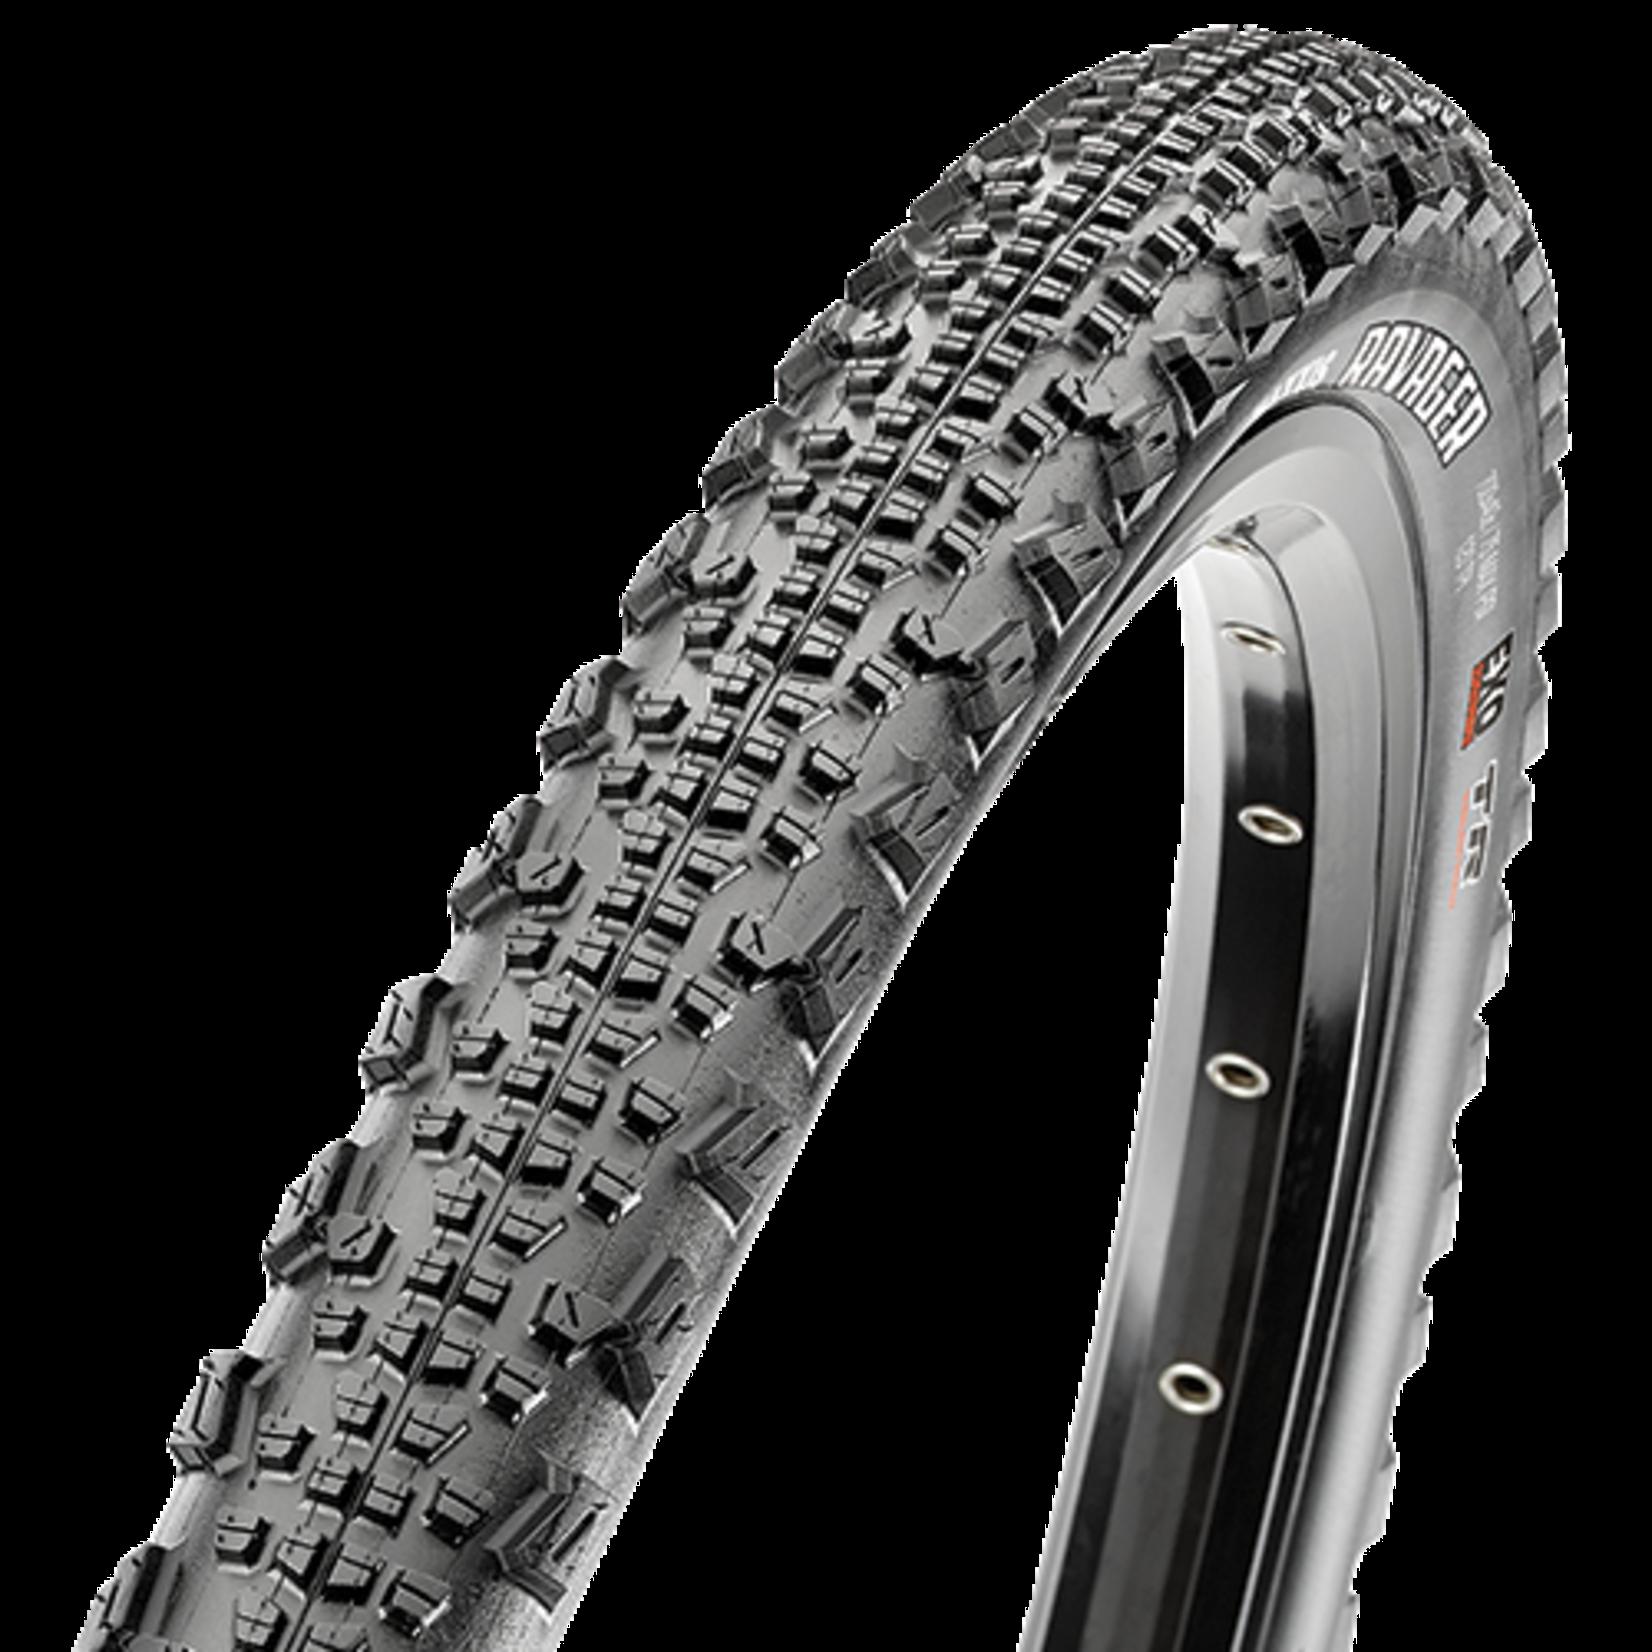 Ravager Tire - 700 x 40, Tubeless, Folding, Black, Dual, EXO